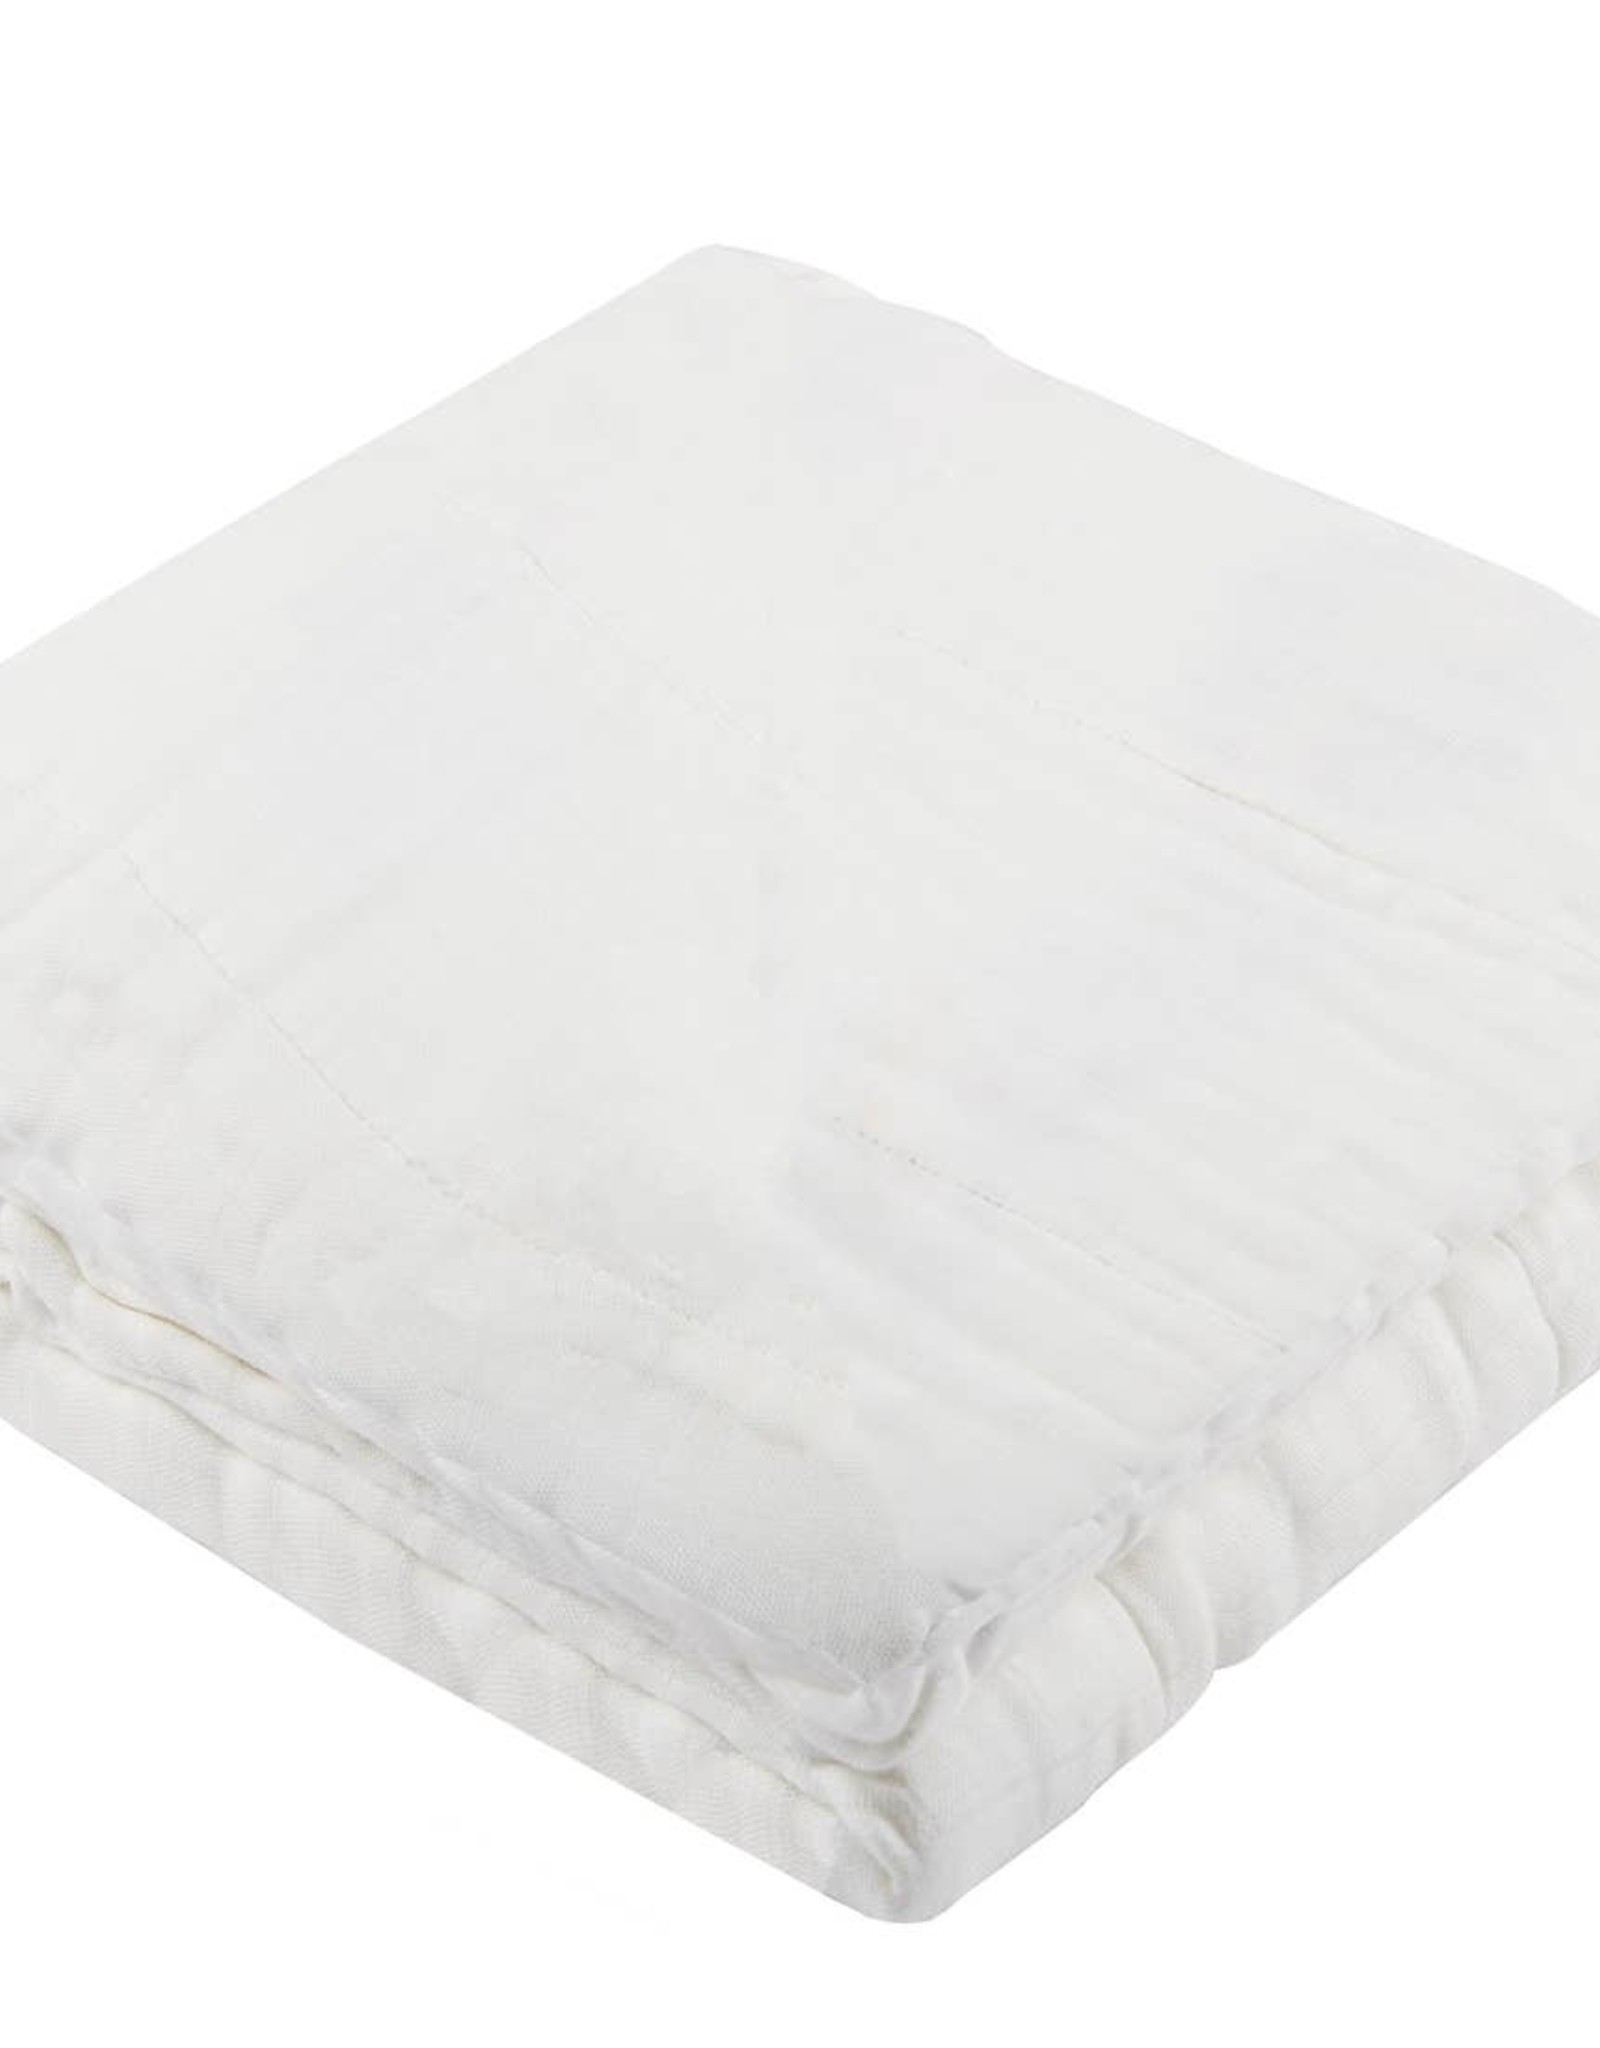 Newcastle classics Pure White Bamboo Blanket